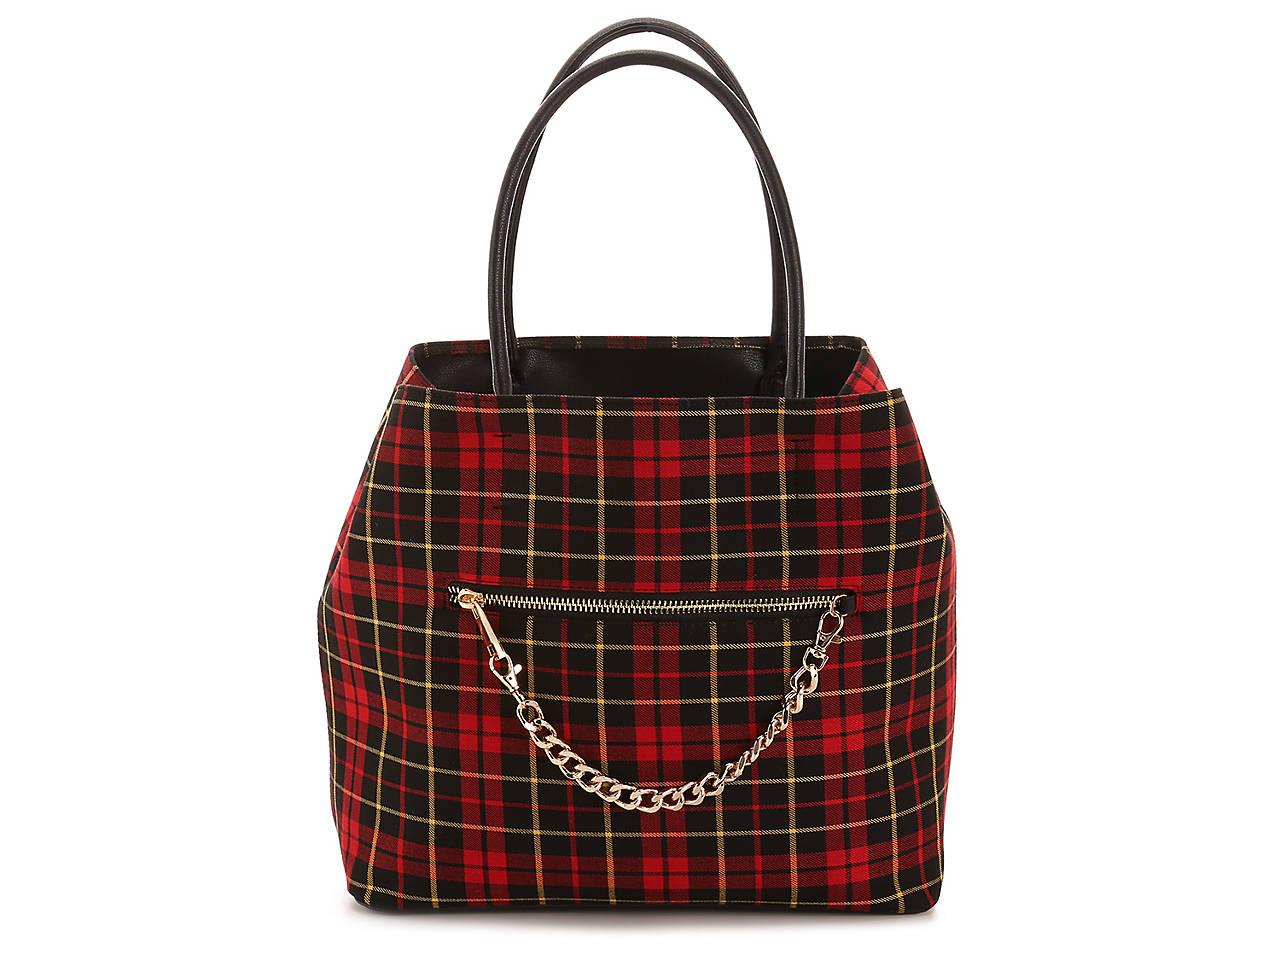 63f062002949 Aldo Koiviel Tote Women s Handbags   Accessories